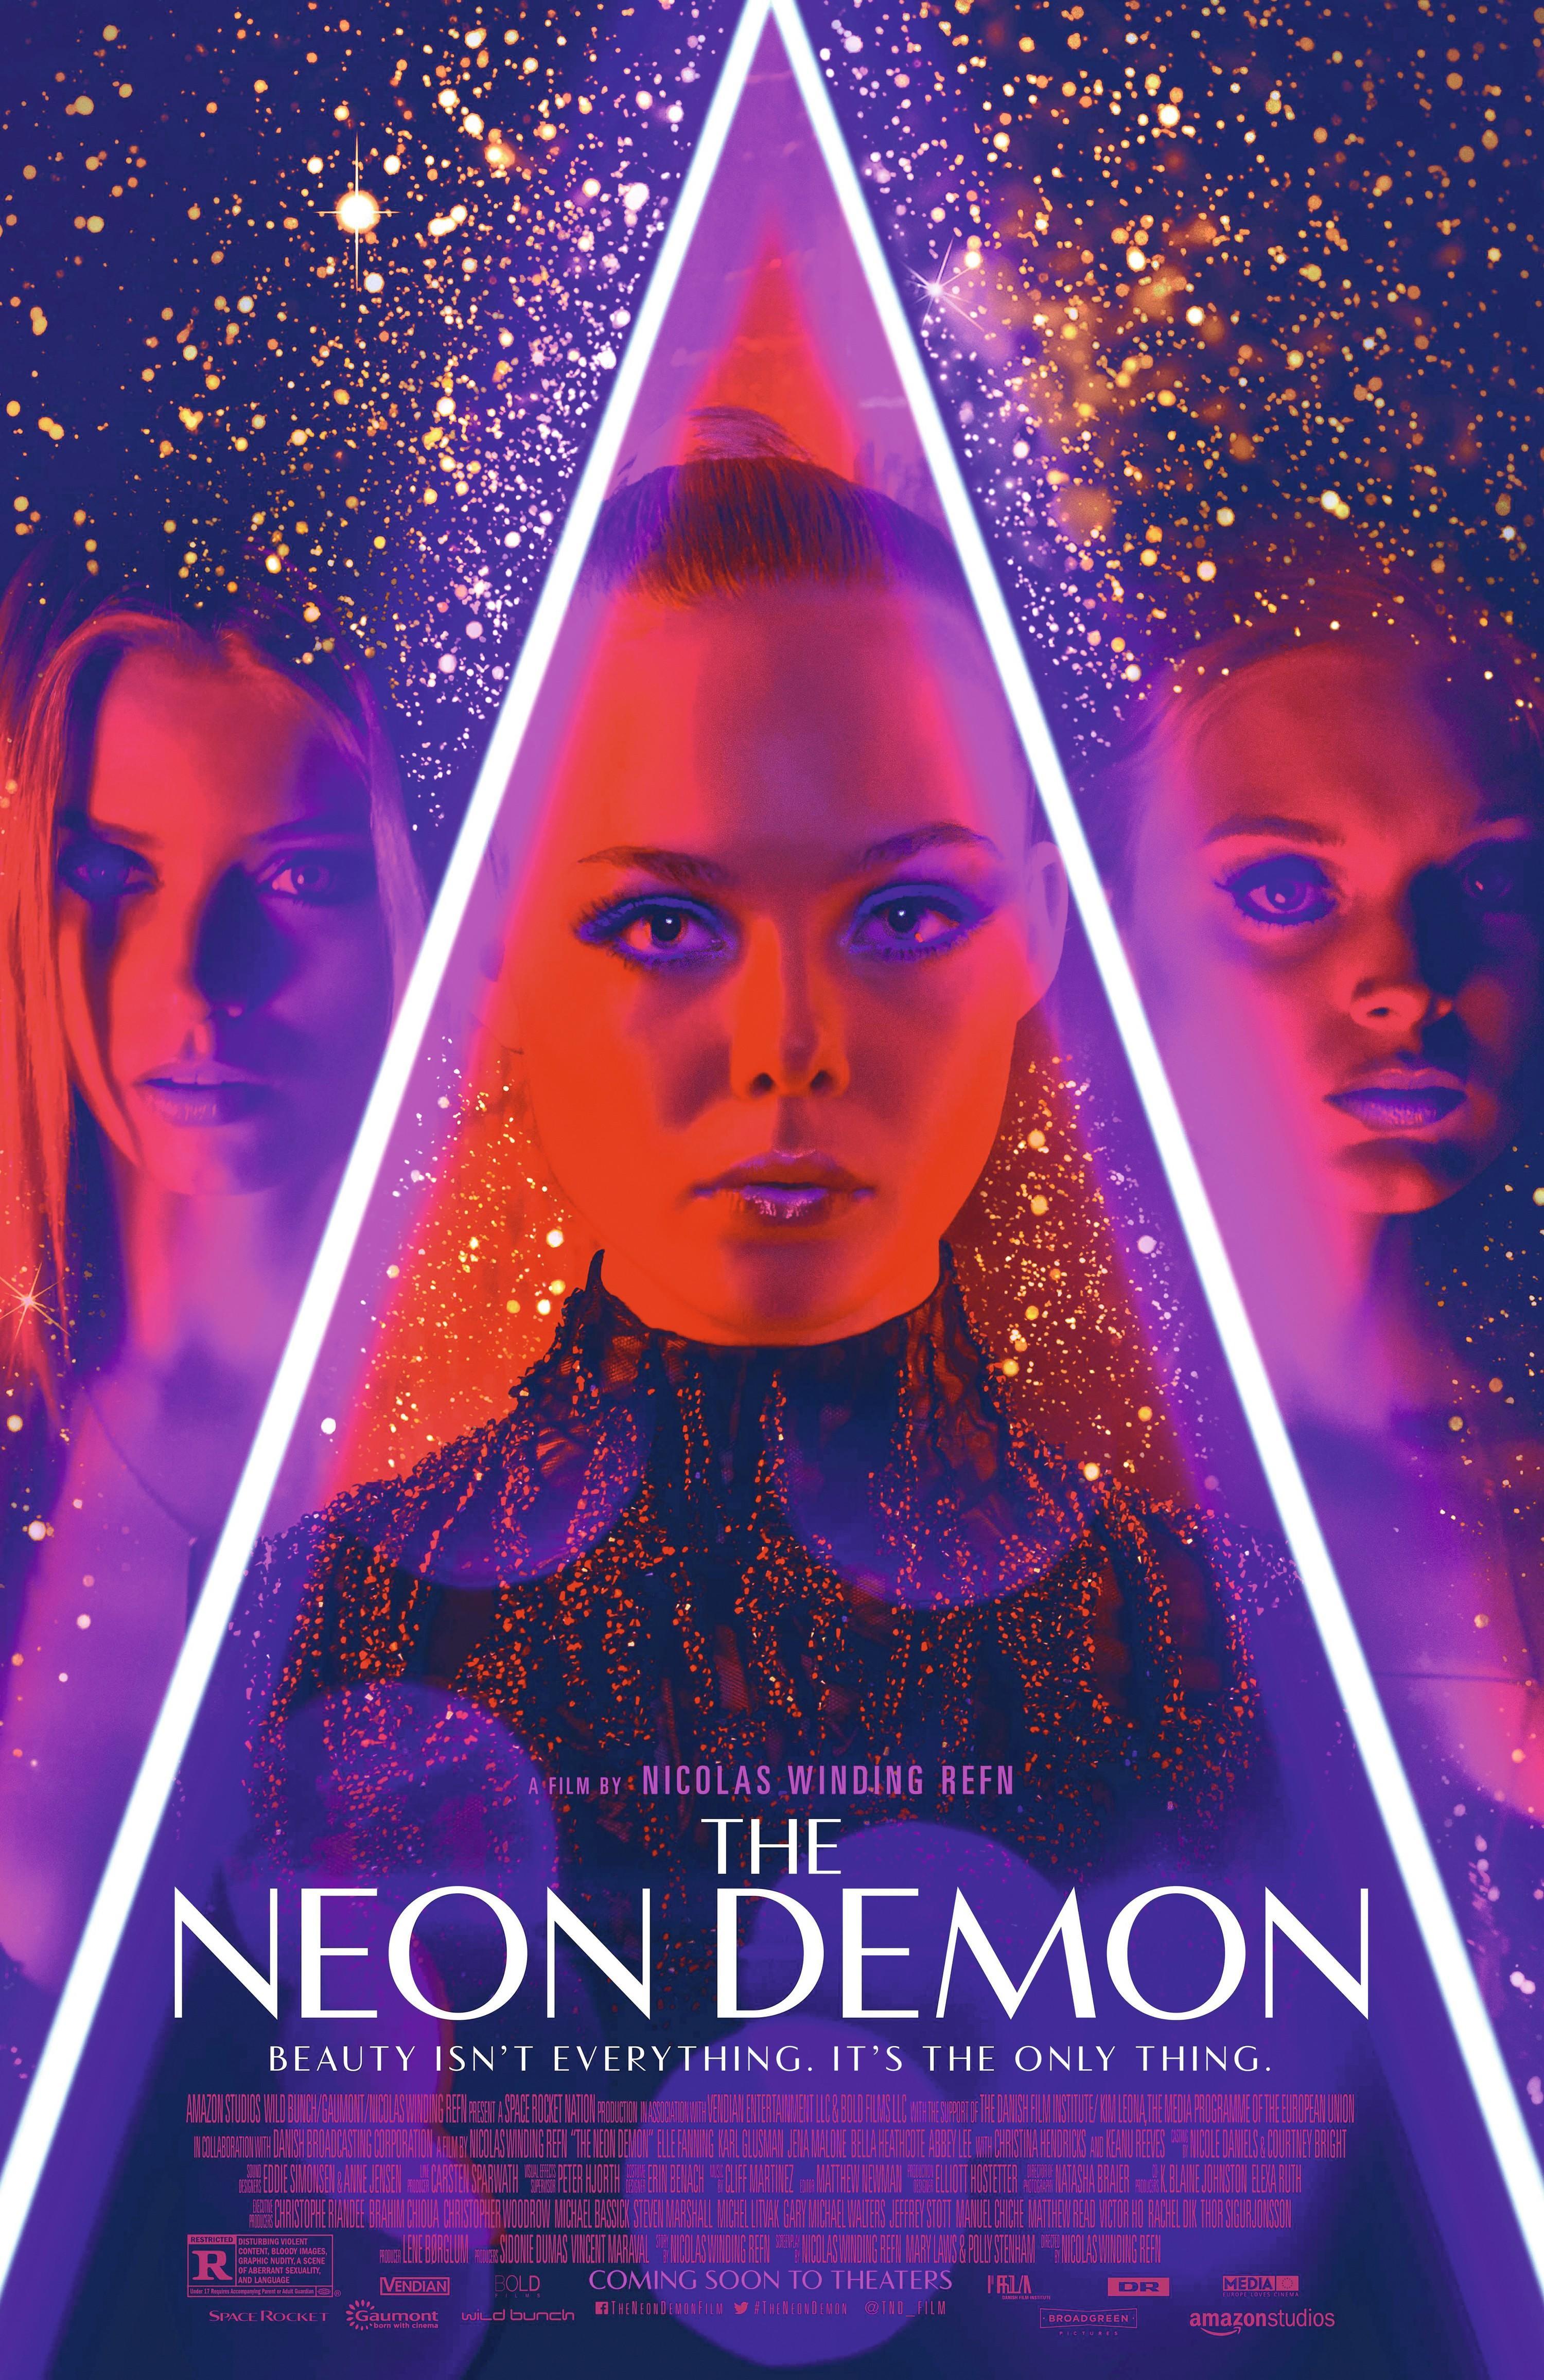 The Neon Demon, by Nicolas Winding Refn, 2016.